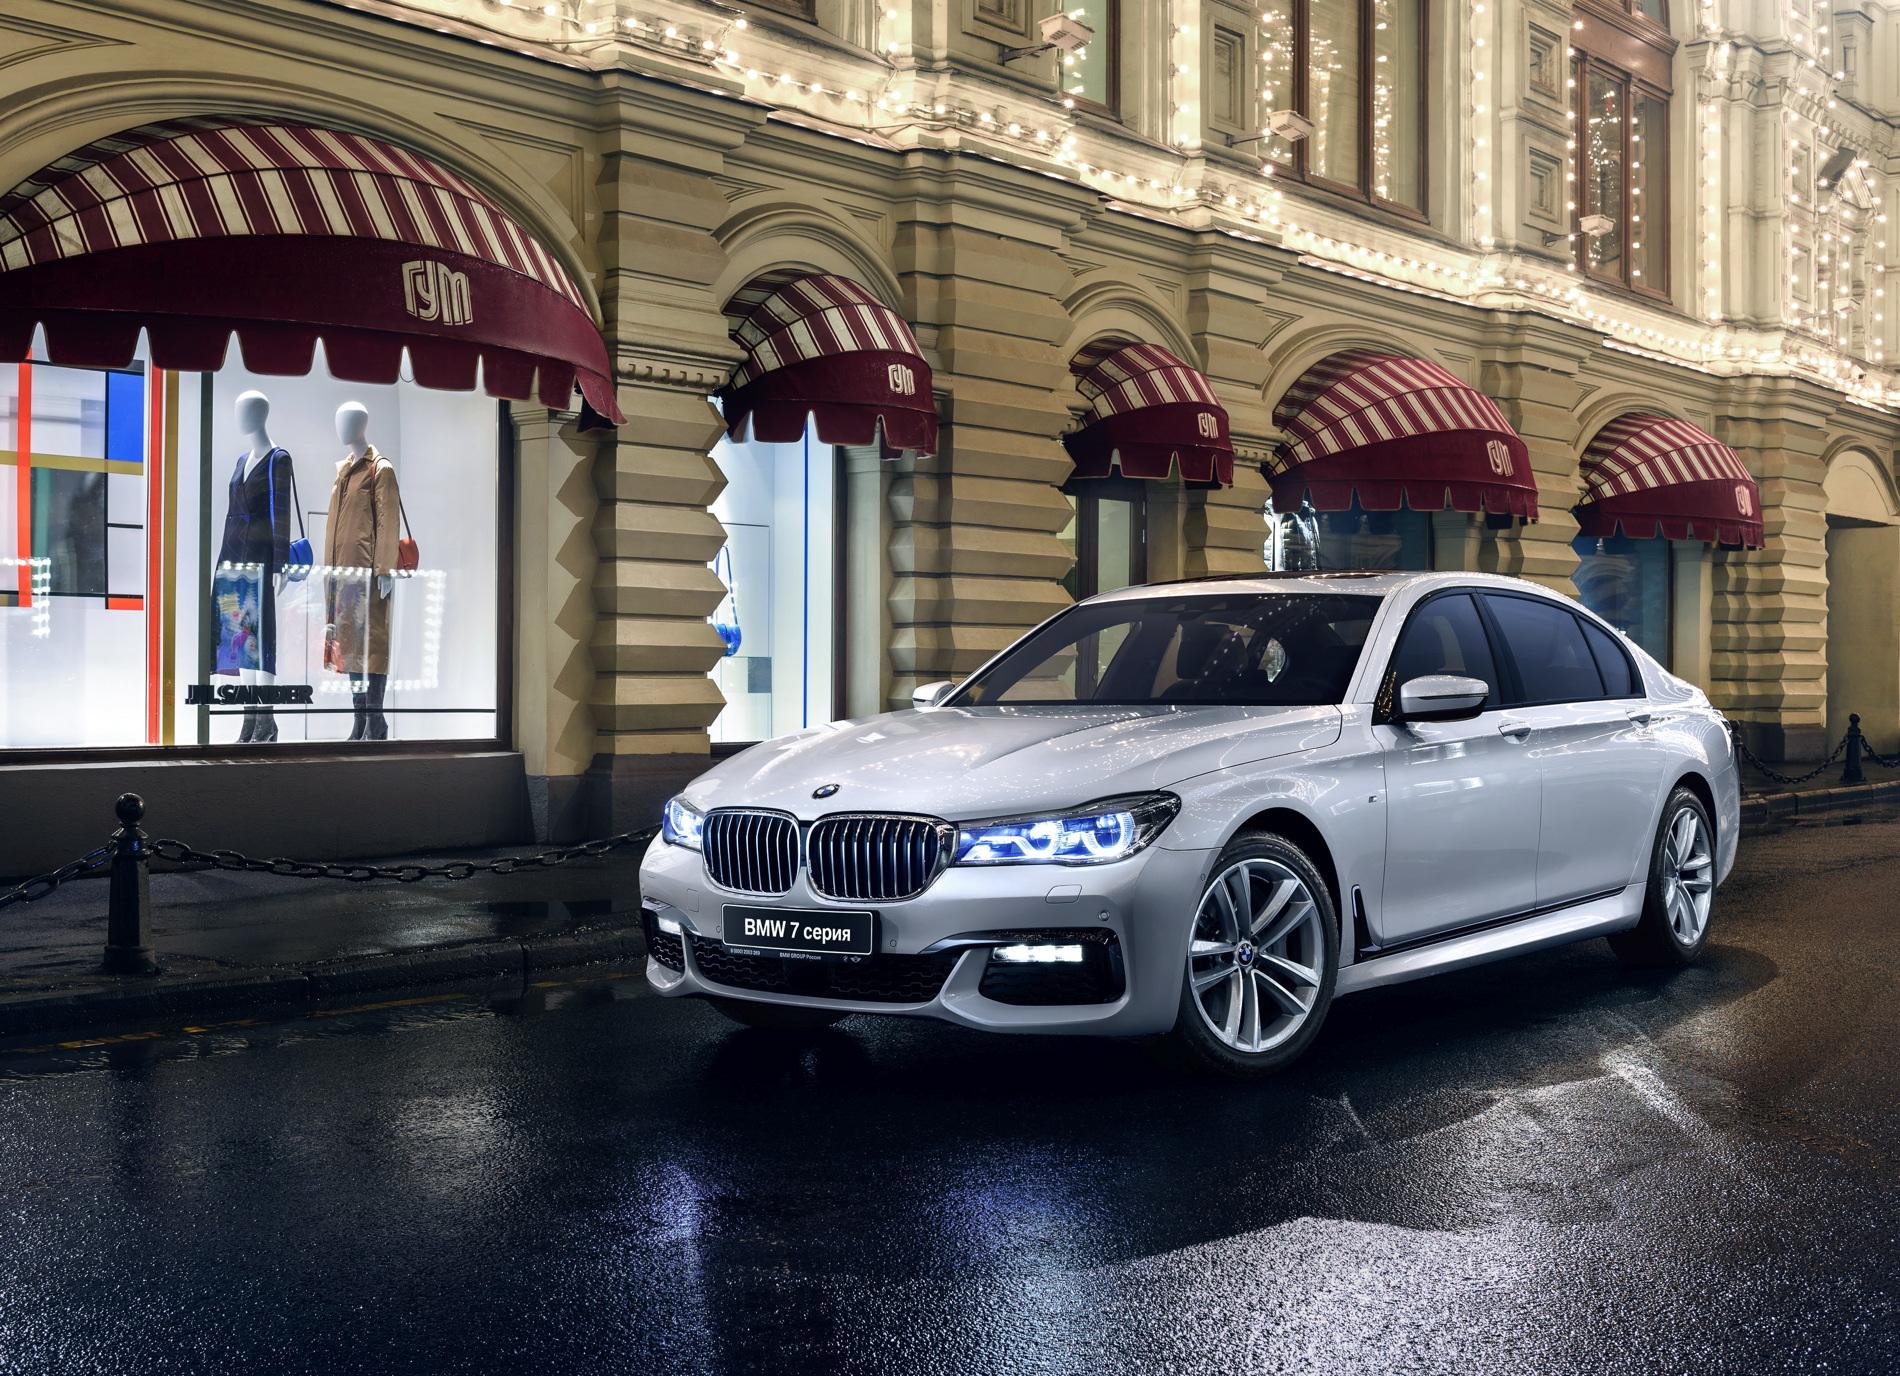 2016 BMW 7 Series luxury images 12